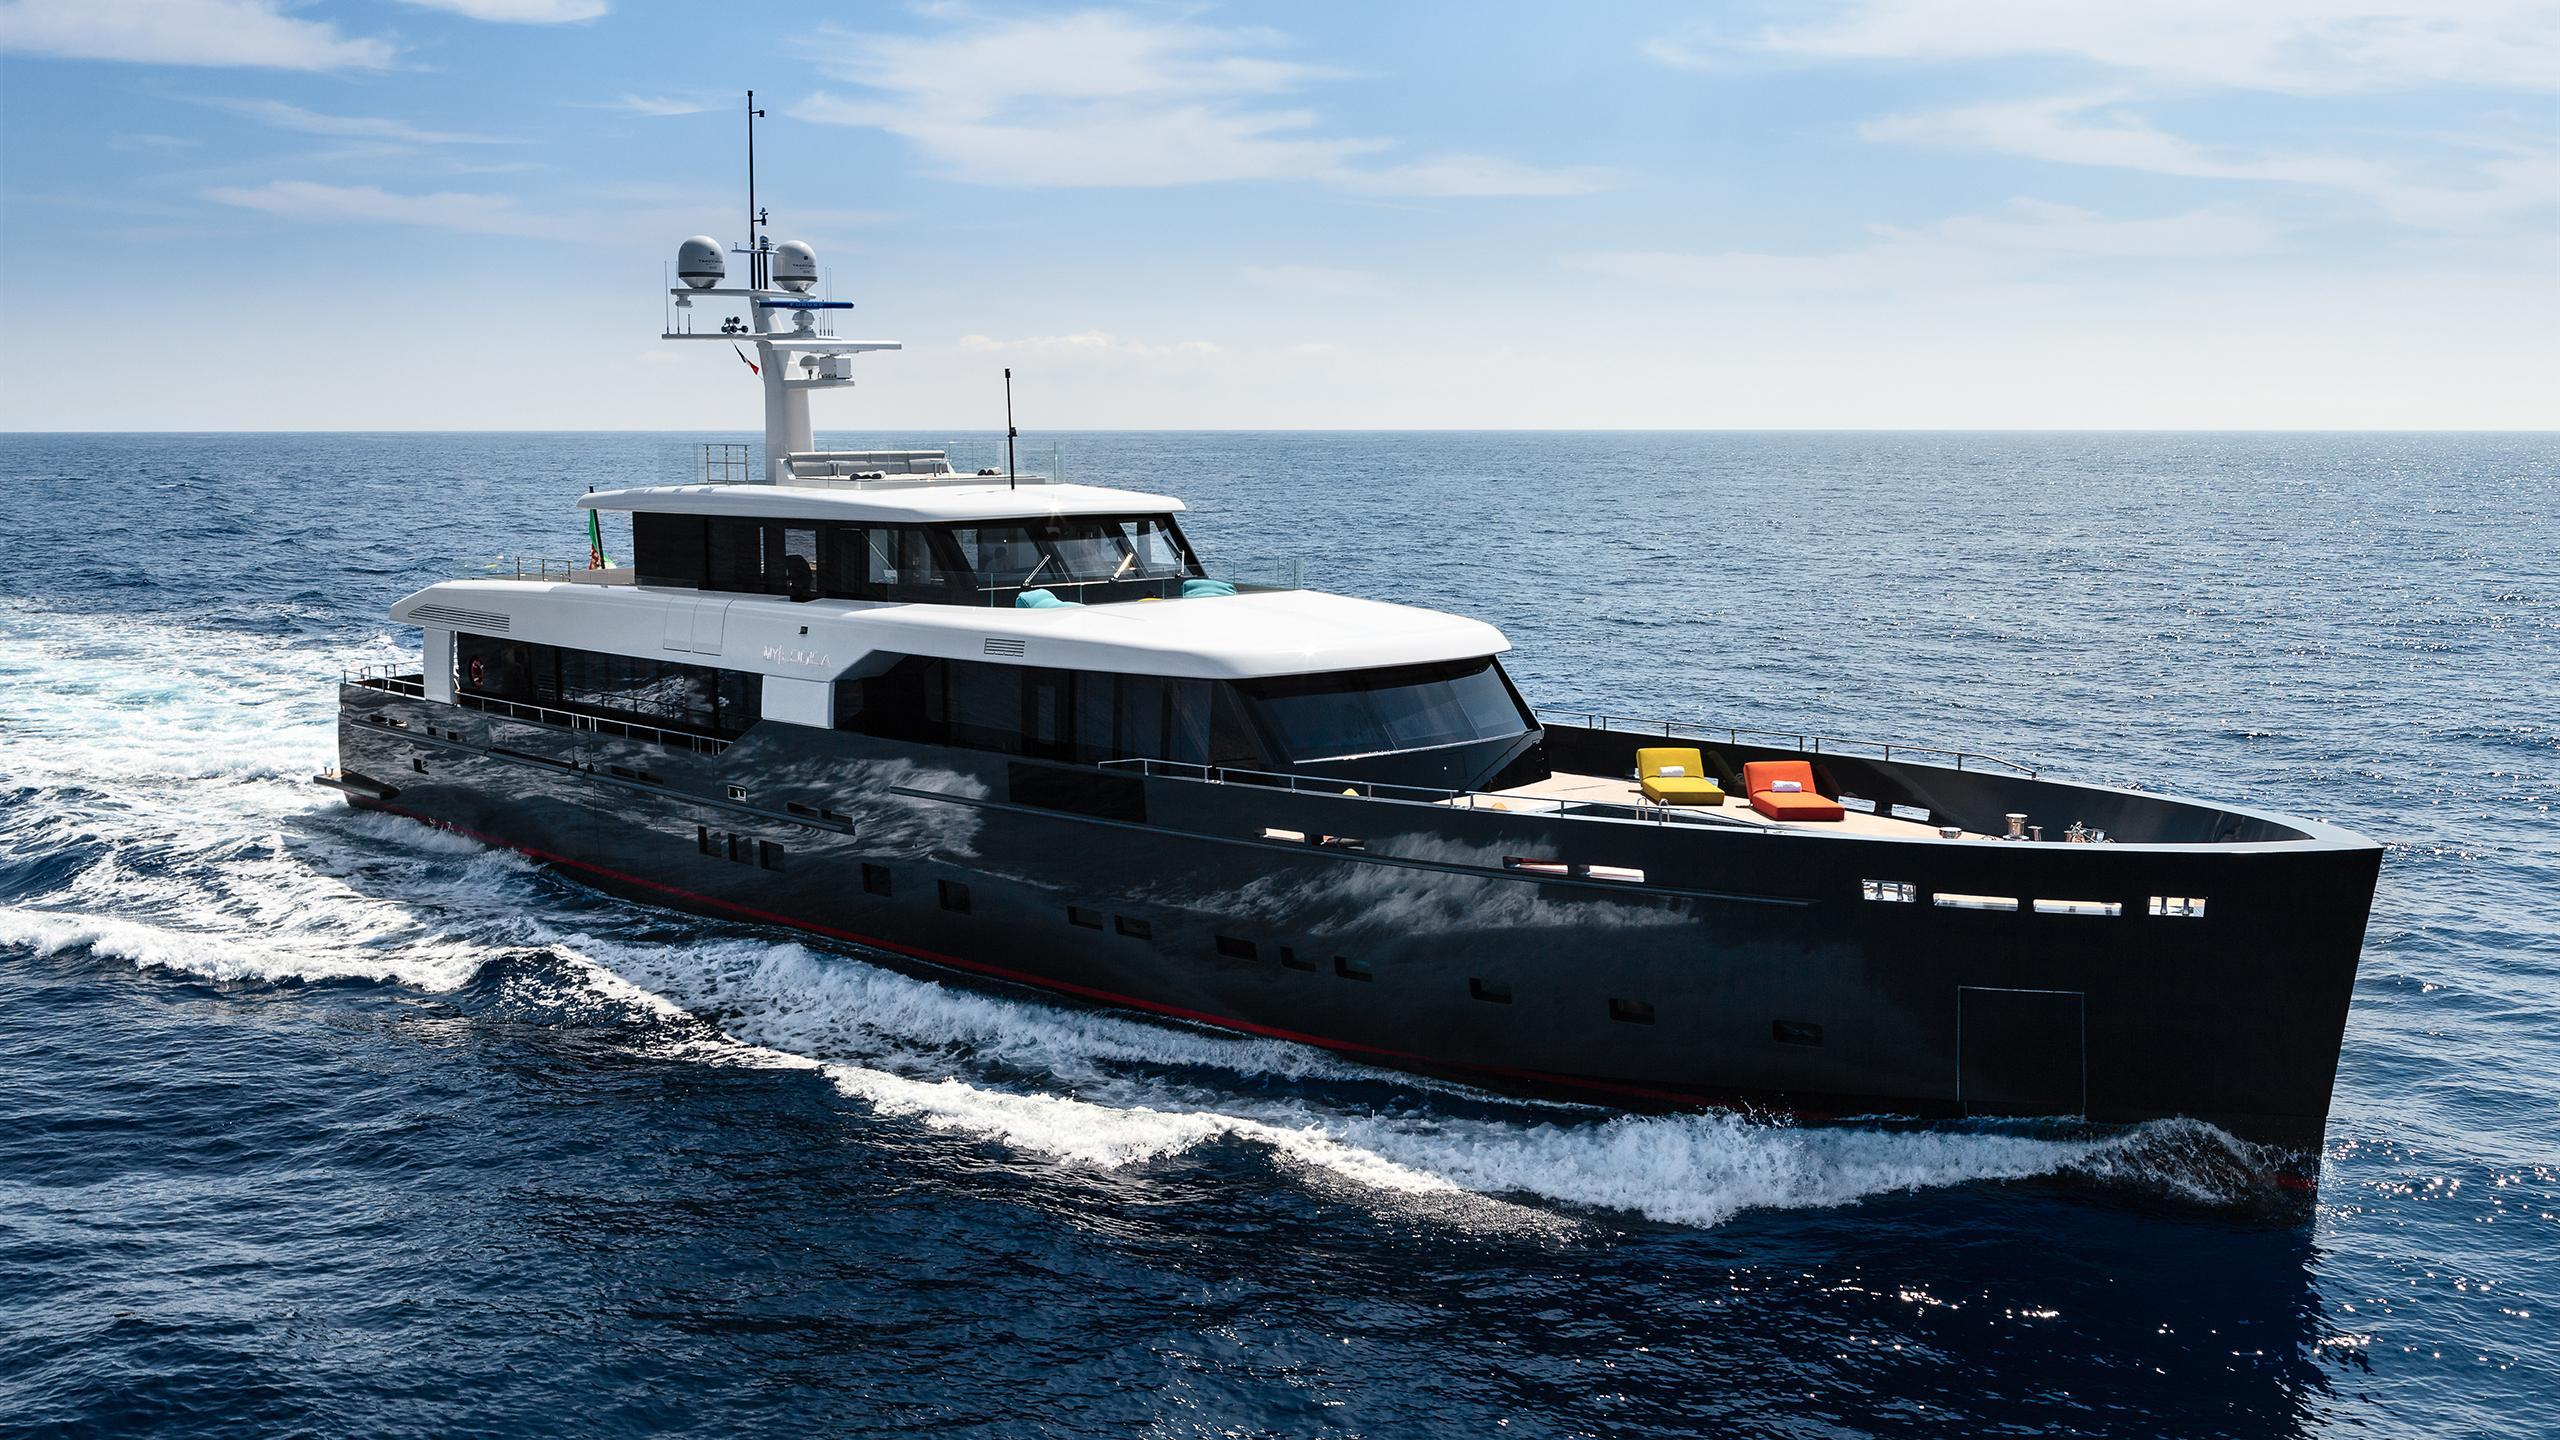 logica-147-motor-yacht-2014-45m-front-profile-cruising